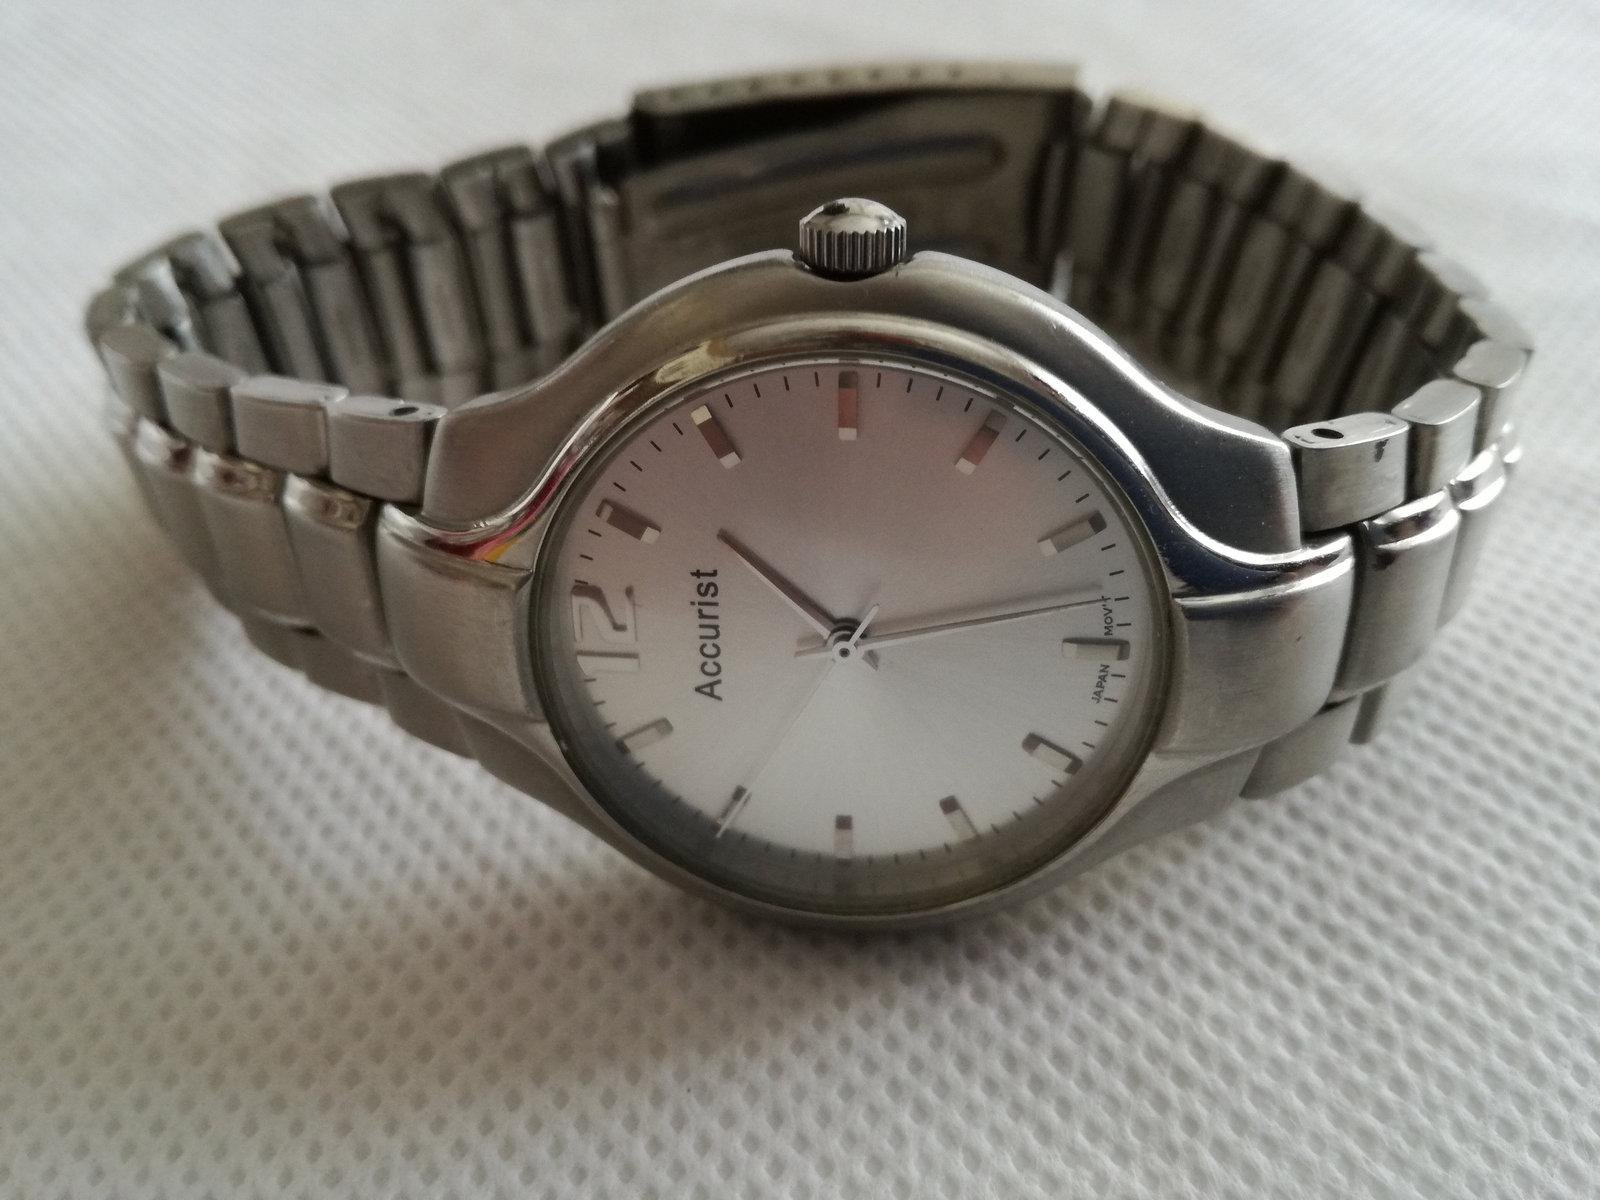 vintage watch / gift for him / vintage wrist watch / vintage  Accurist Watch / w image 6